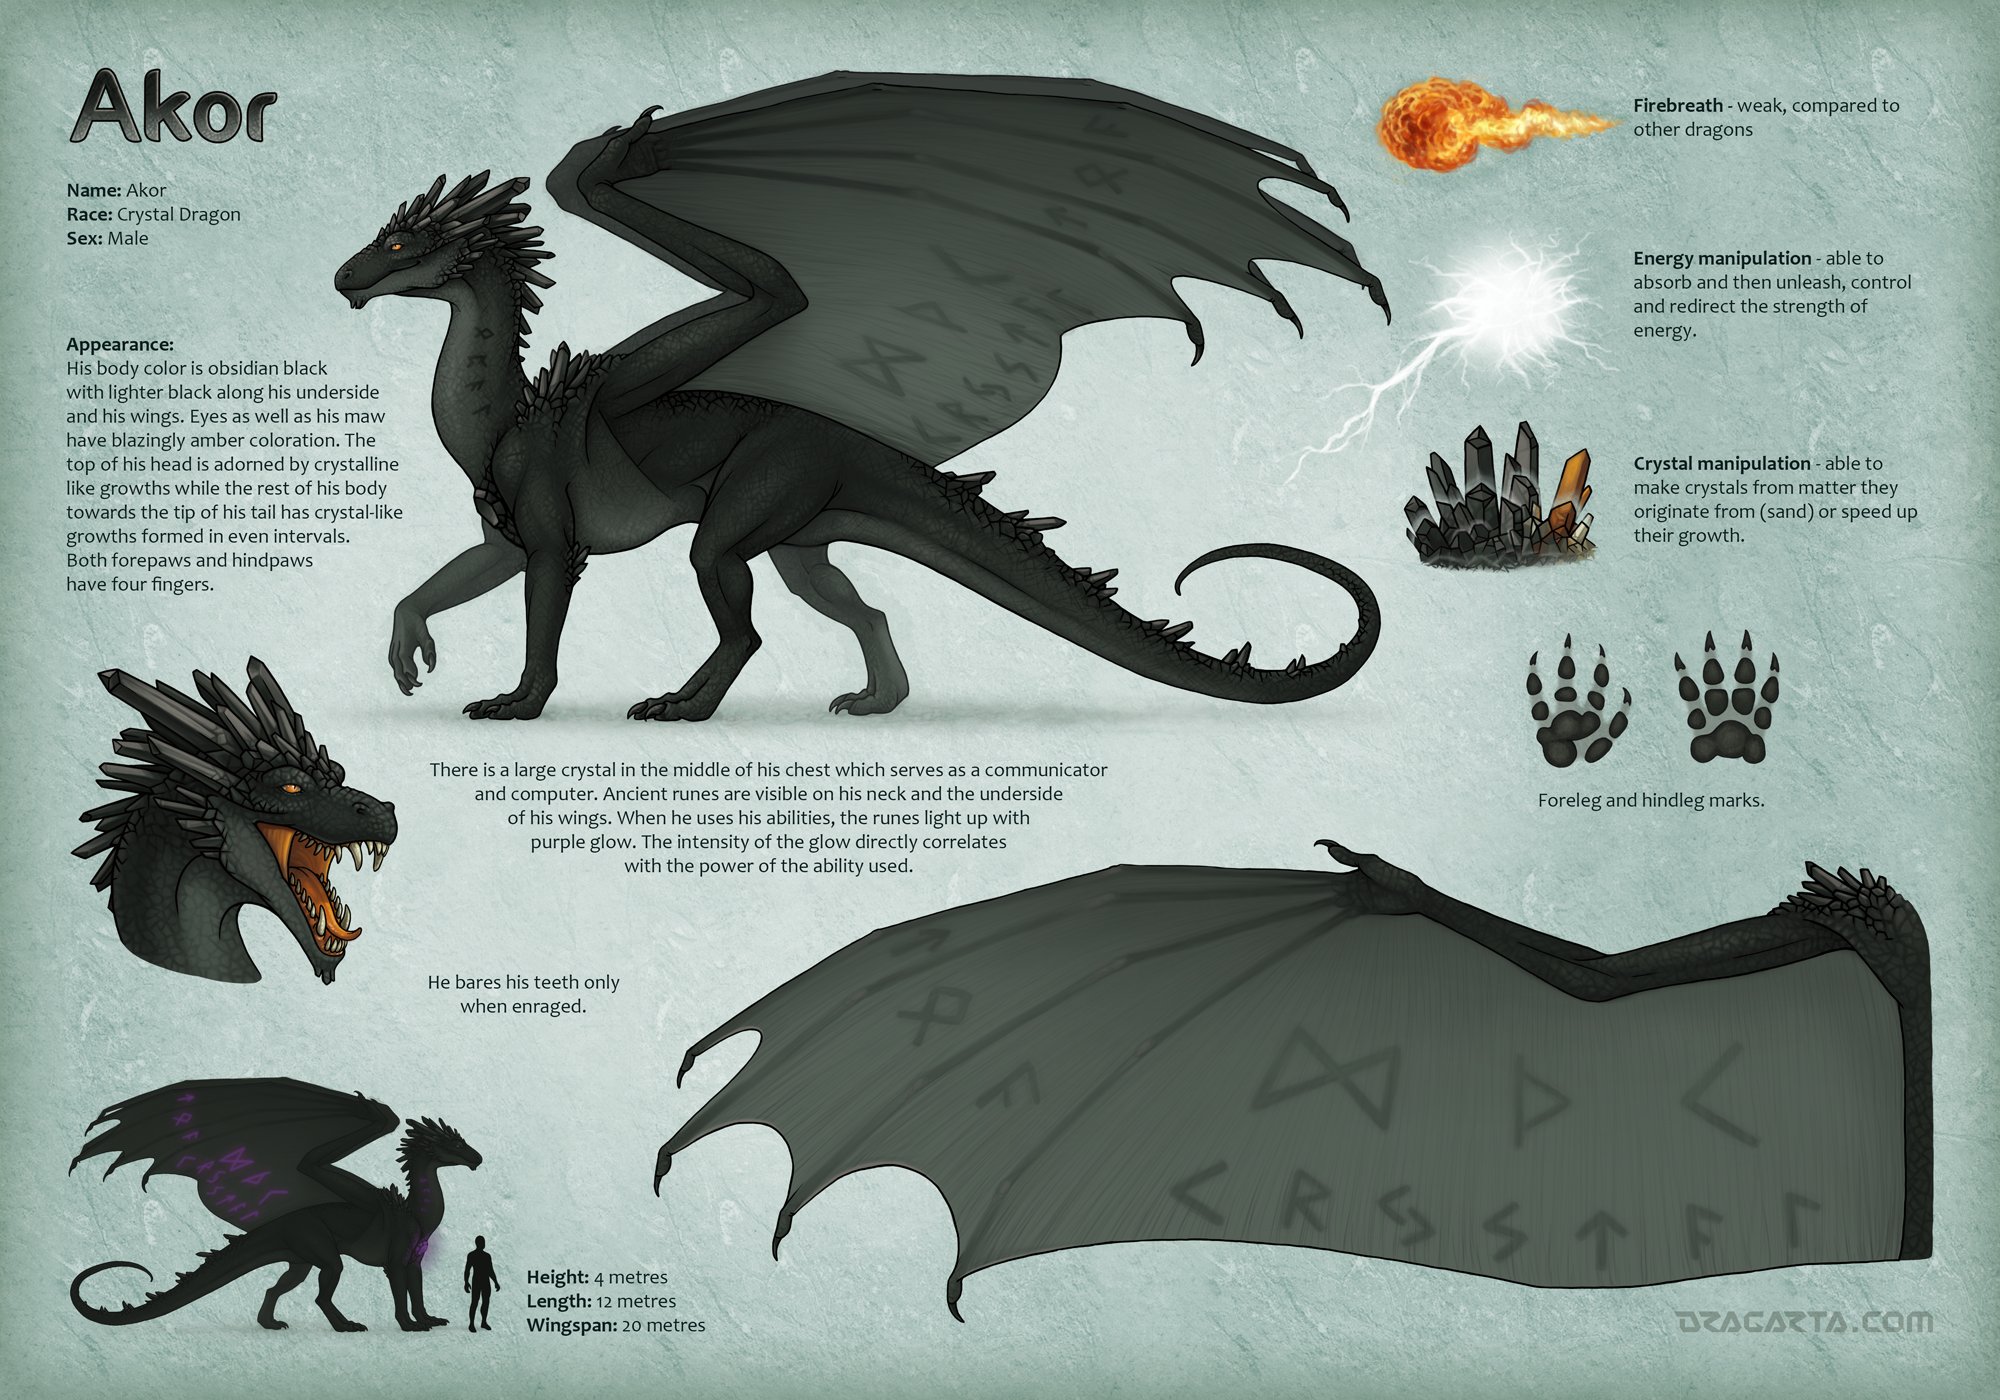 Character sheet for Akor by Dragarta